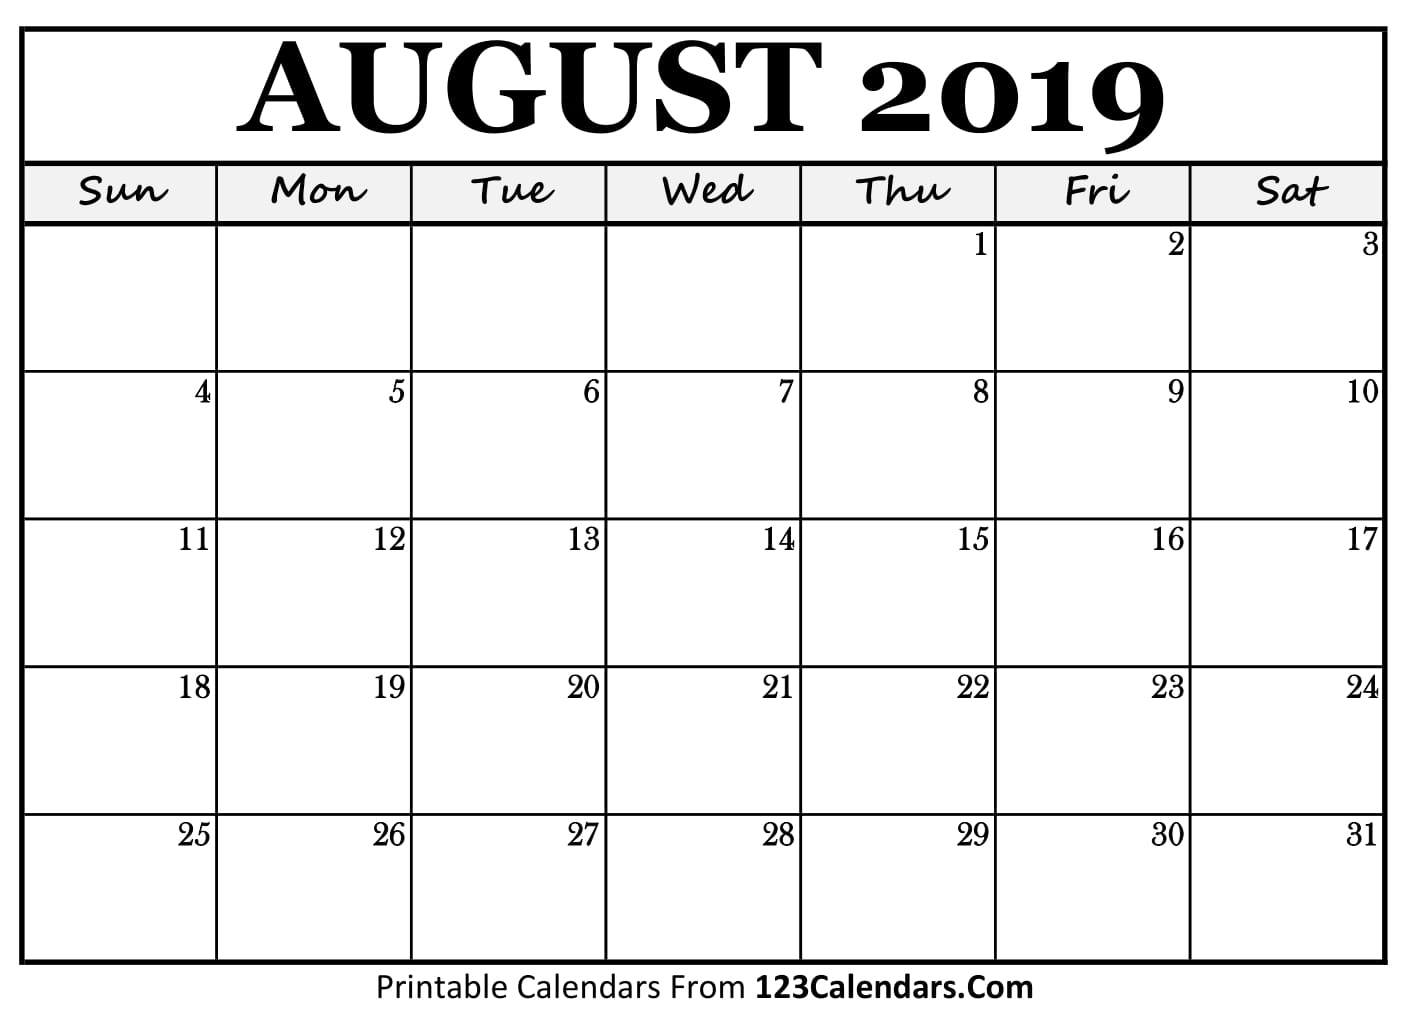 August 2019 Printable Calendar | 123Calendars with regard to Calendar Template For August